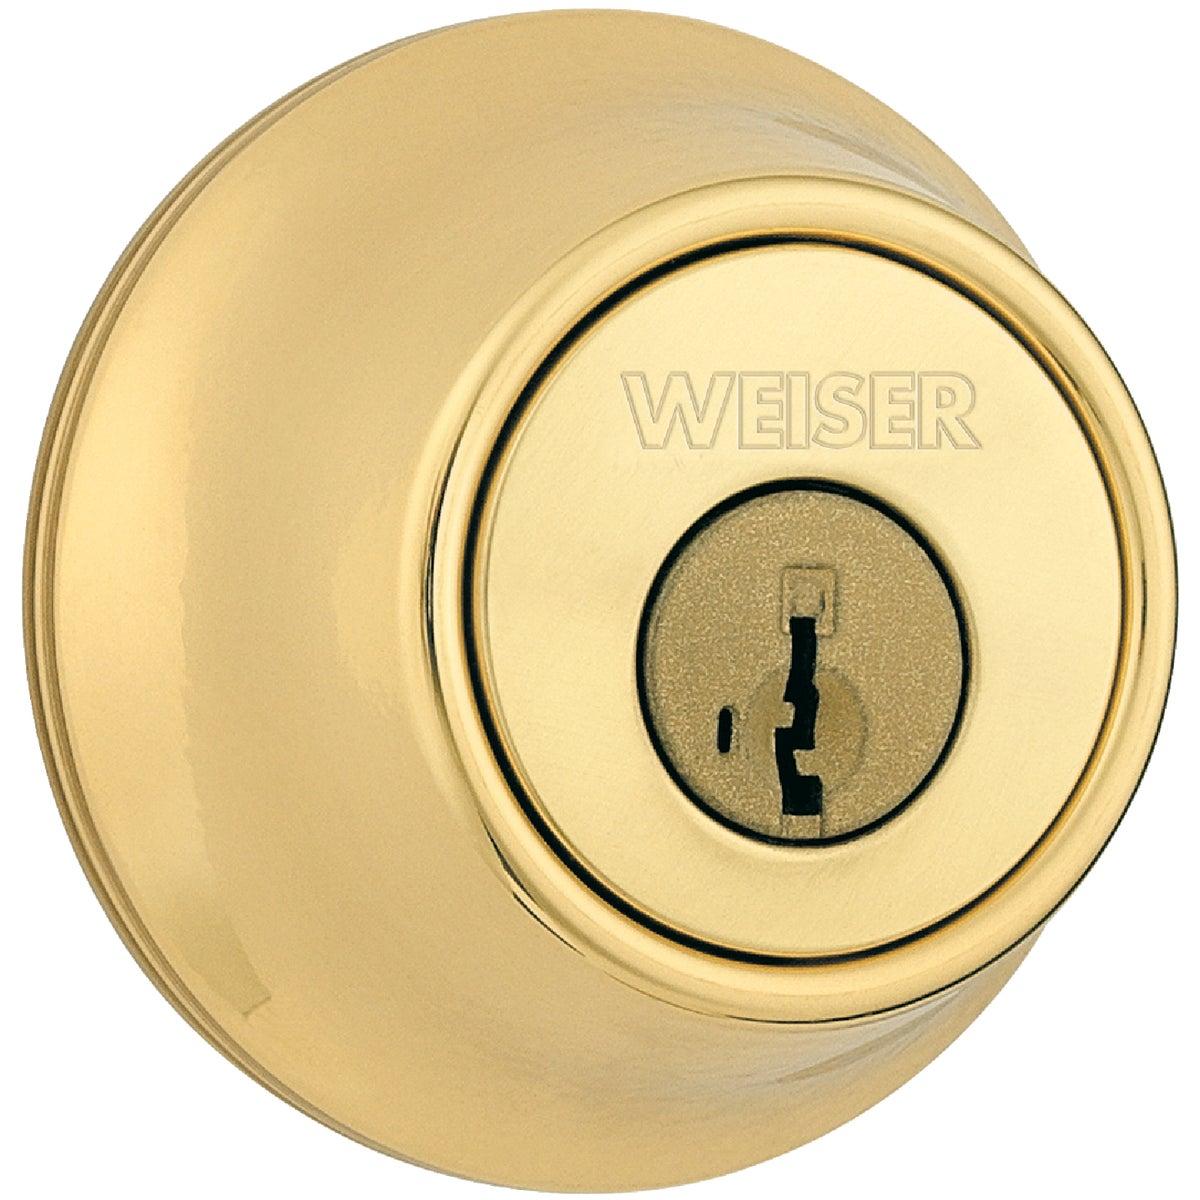 Weiser Lock PB 1CYL DEADBOLT GDC9471 3 KW K3